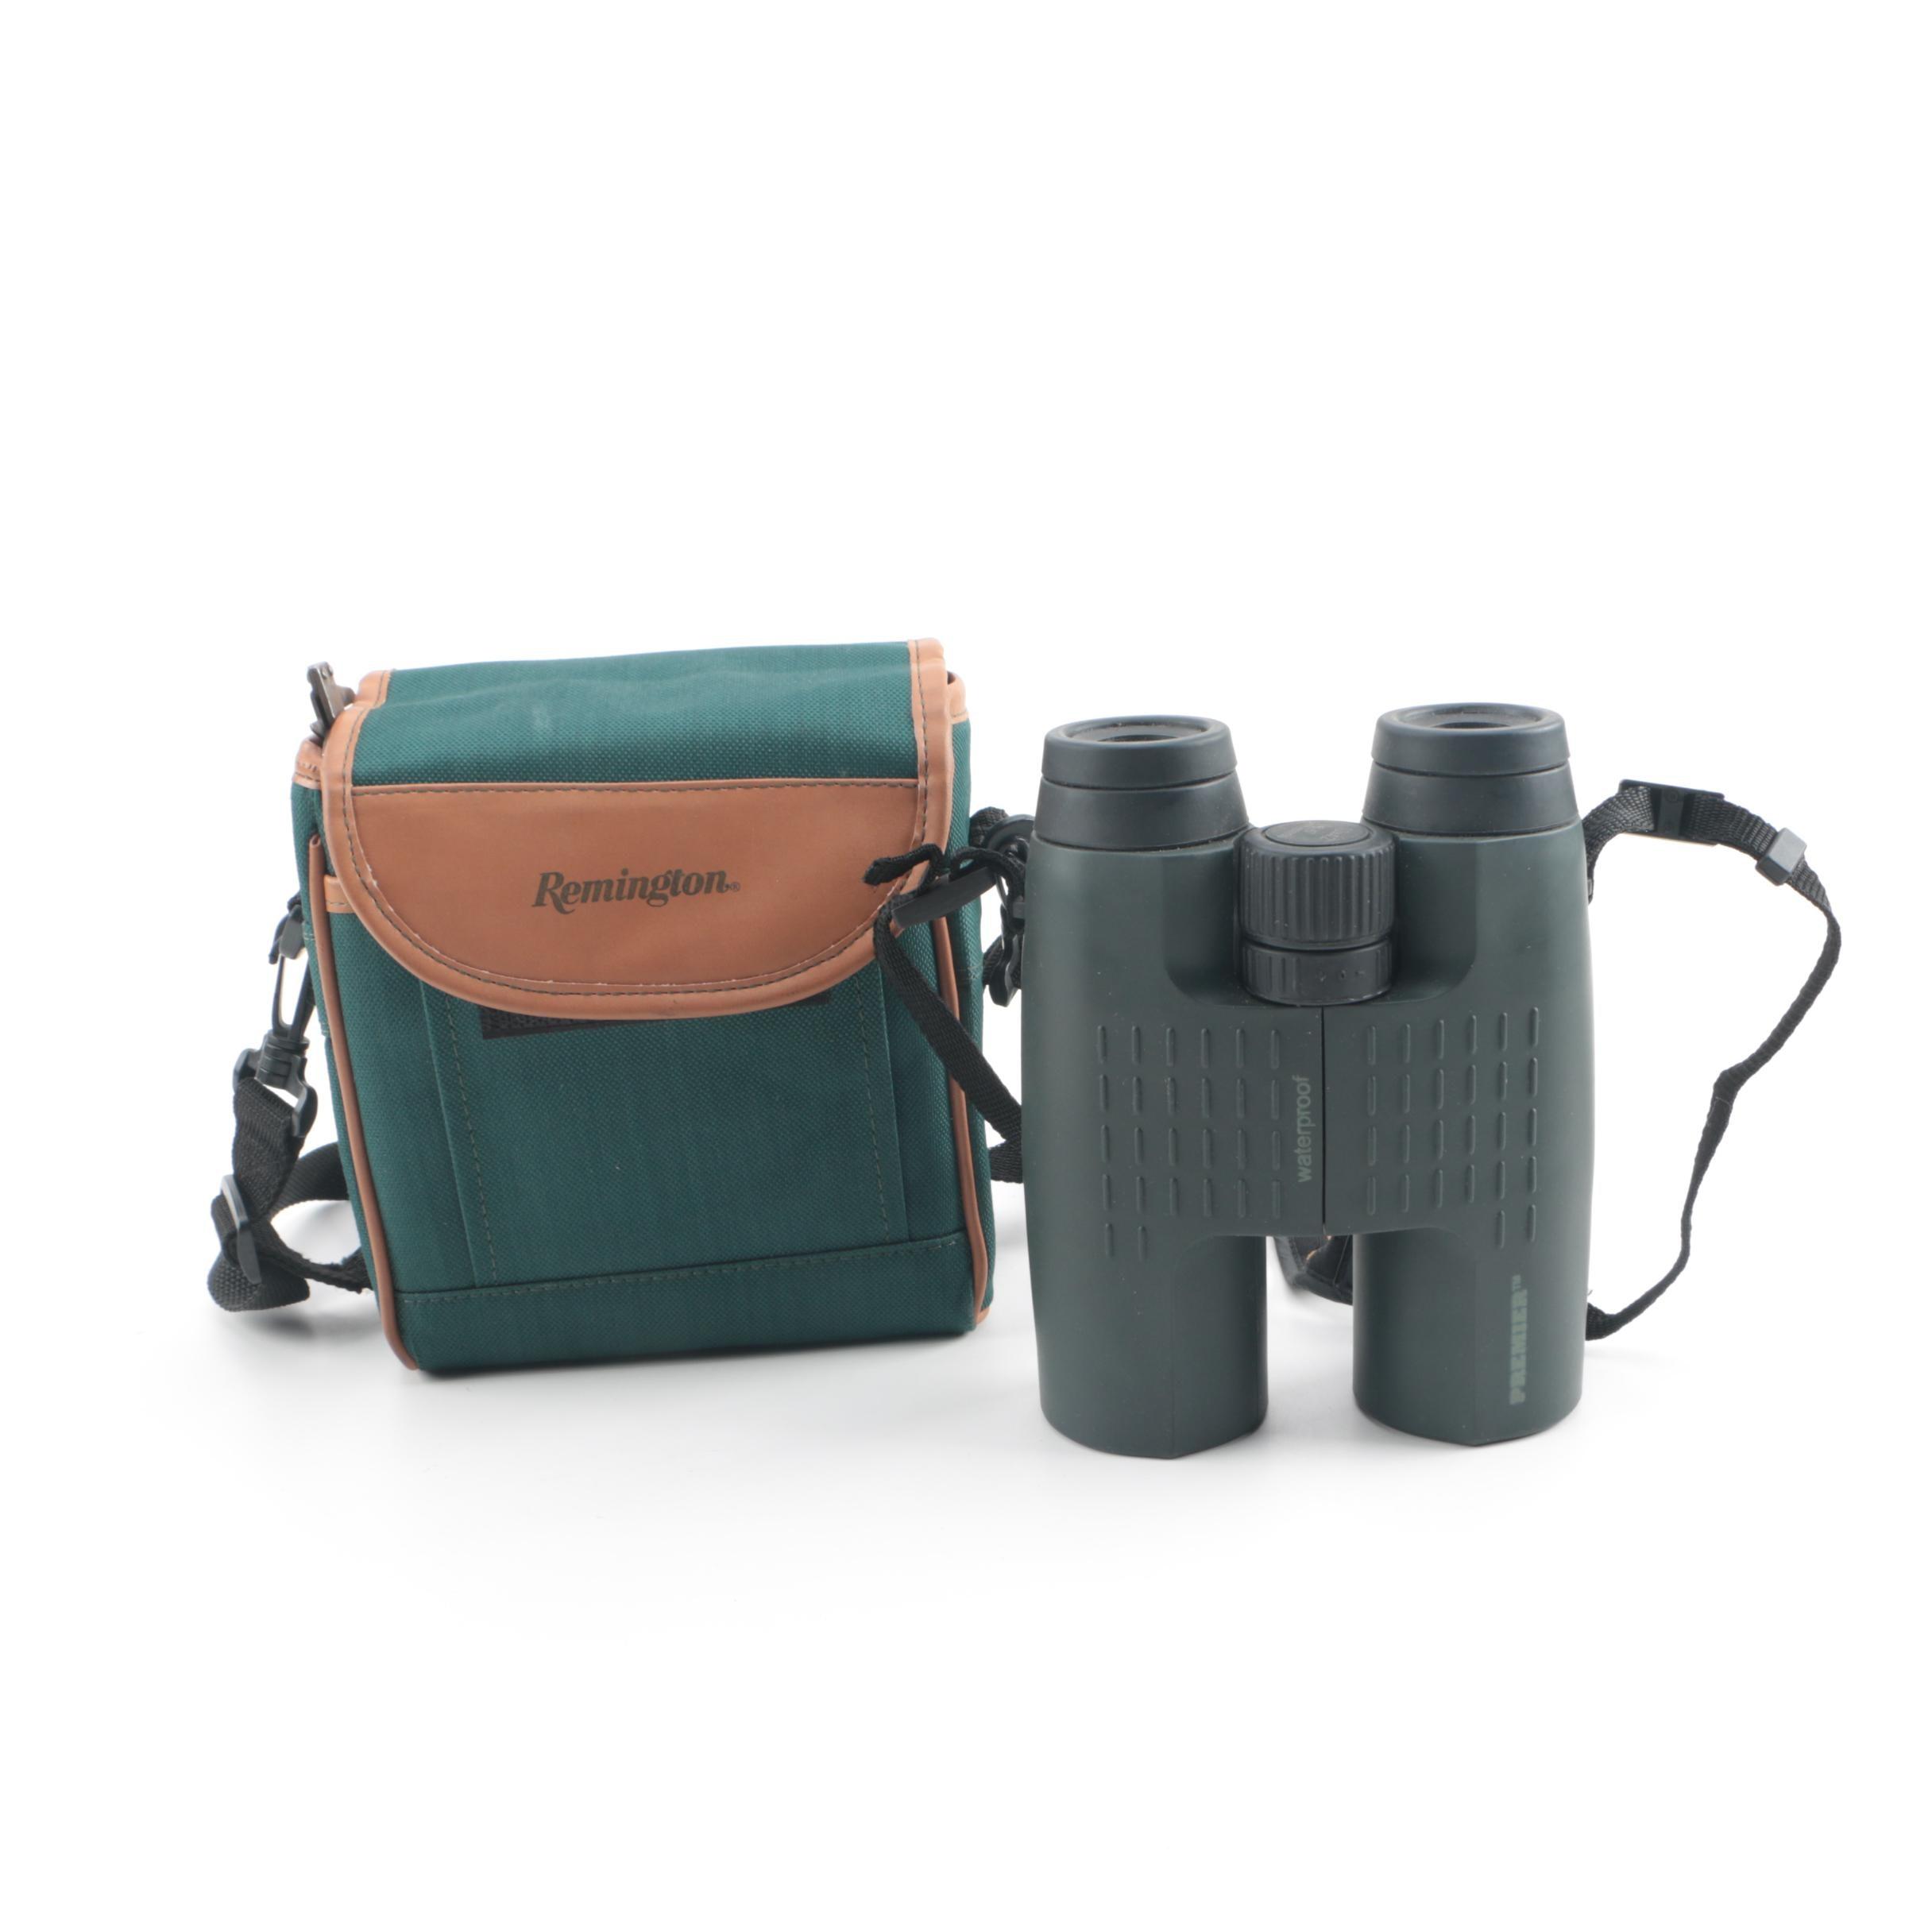 Remington Premiere Waterproof Binoculars with Canvas Case